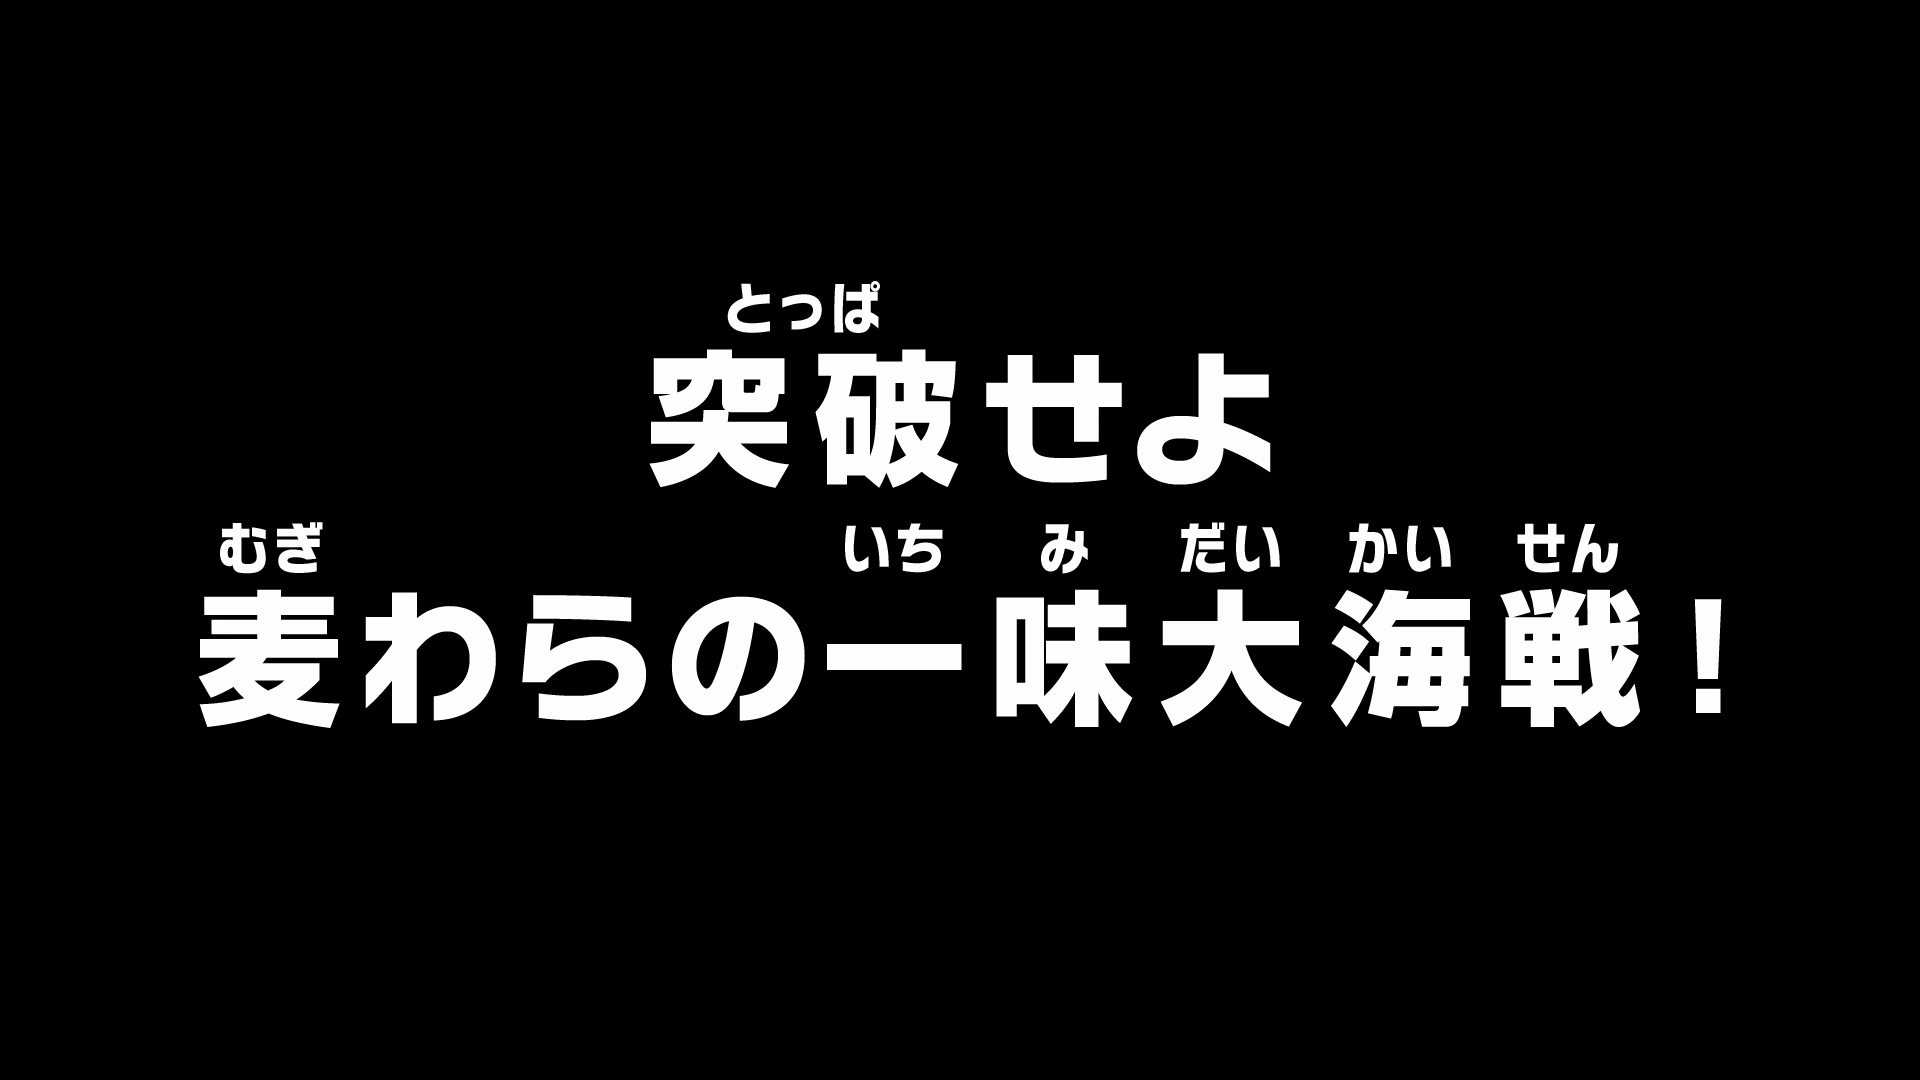 Episode 863